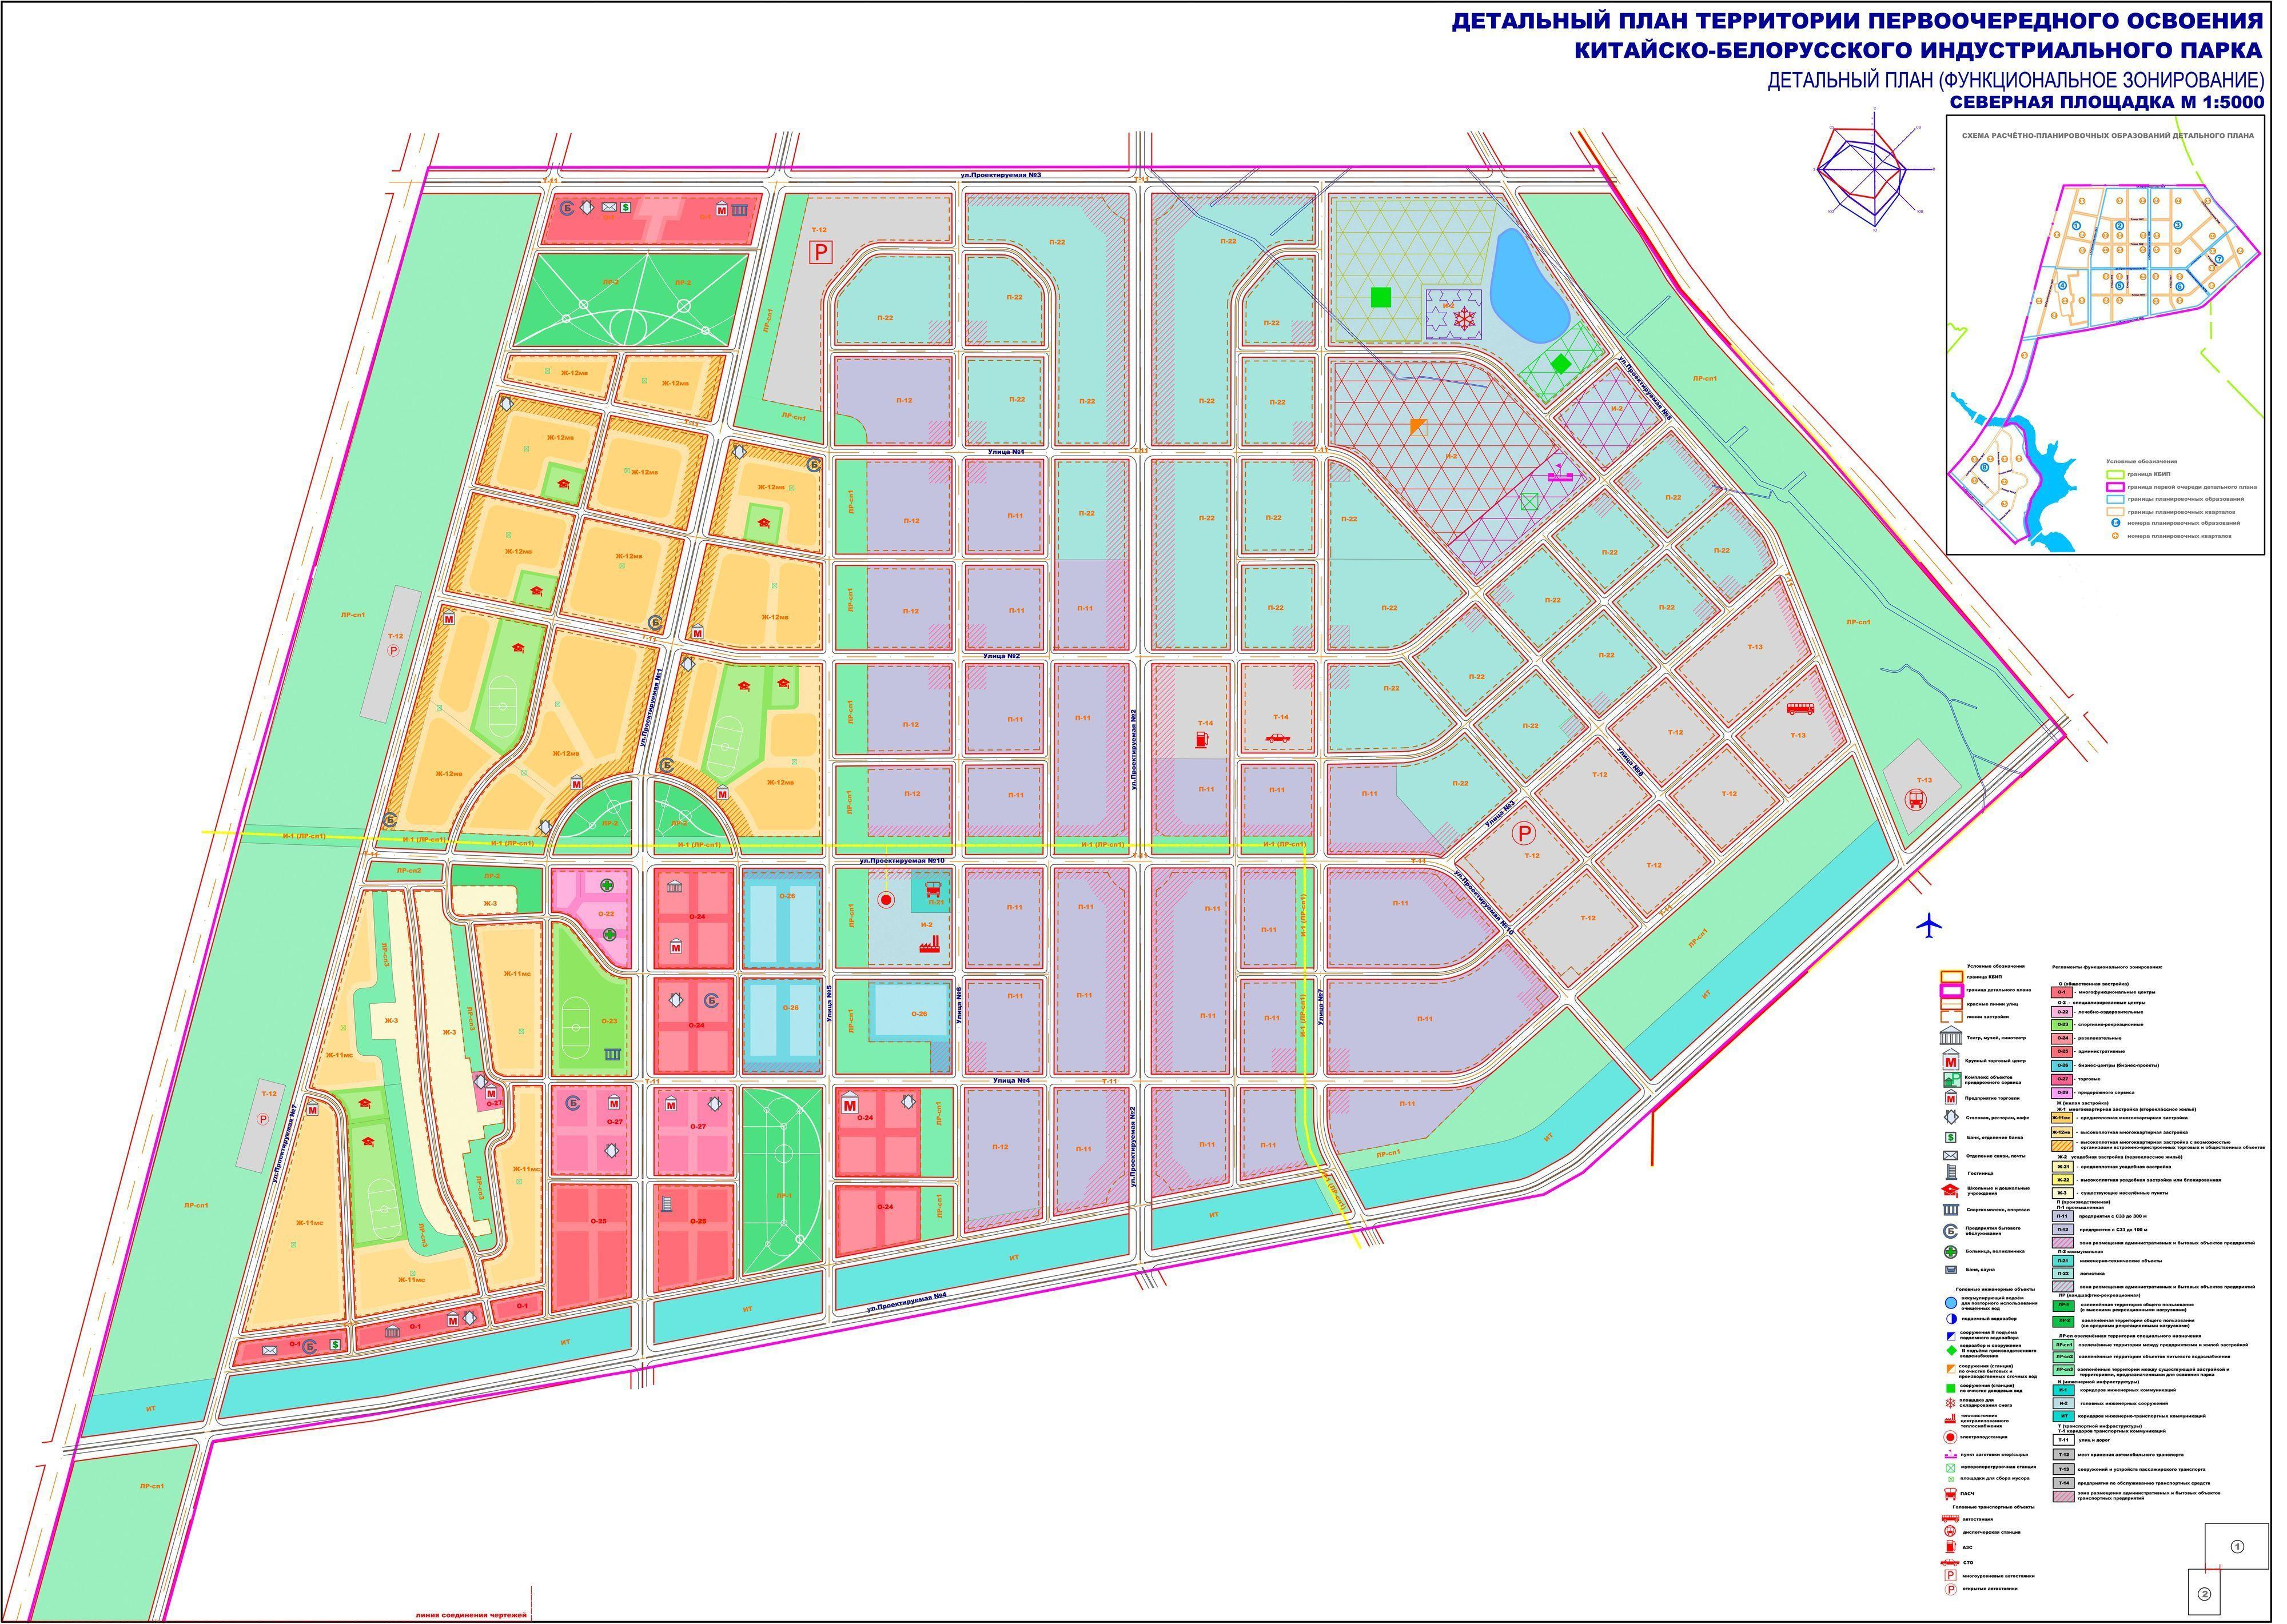 схема на карте белорусско-китайского технопарка